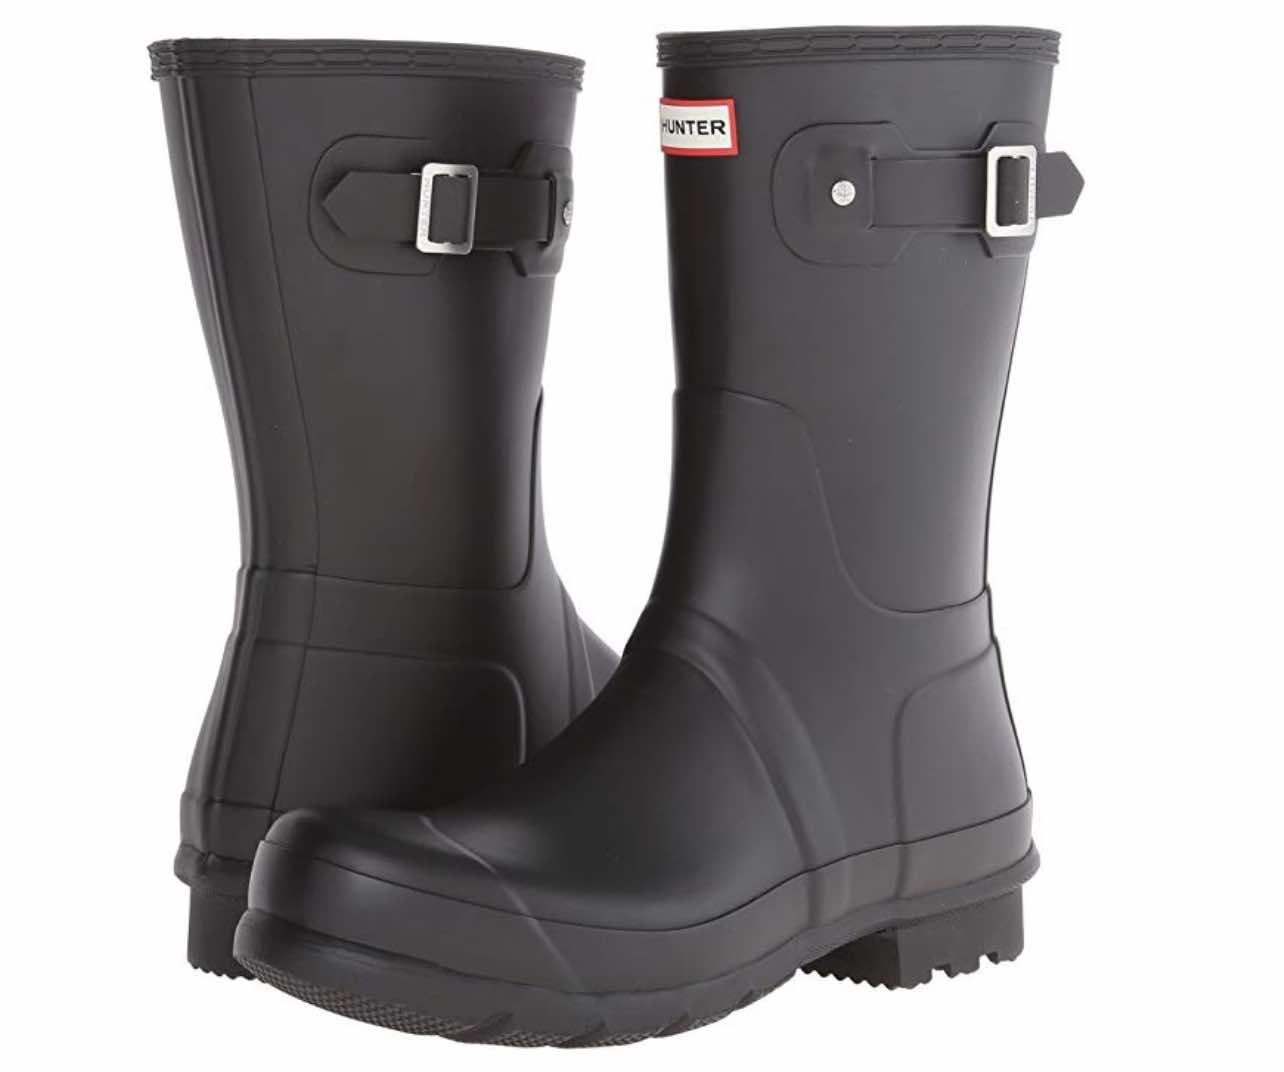 Best Rain Boots for Music Festivals